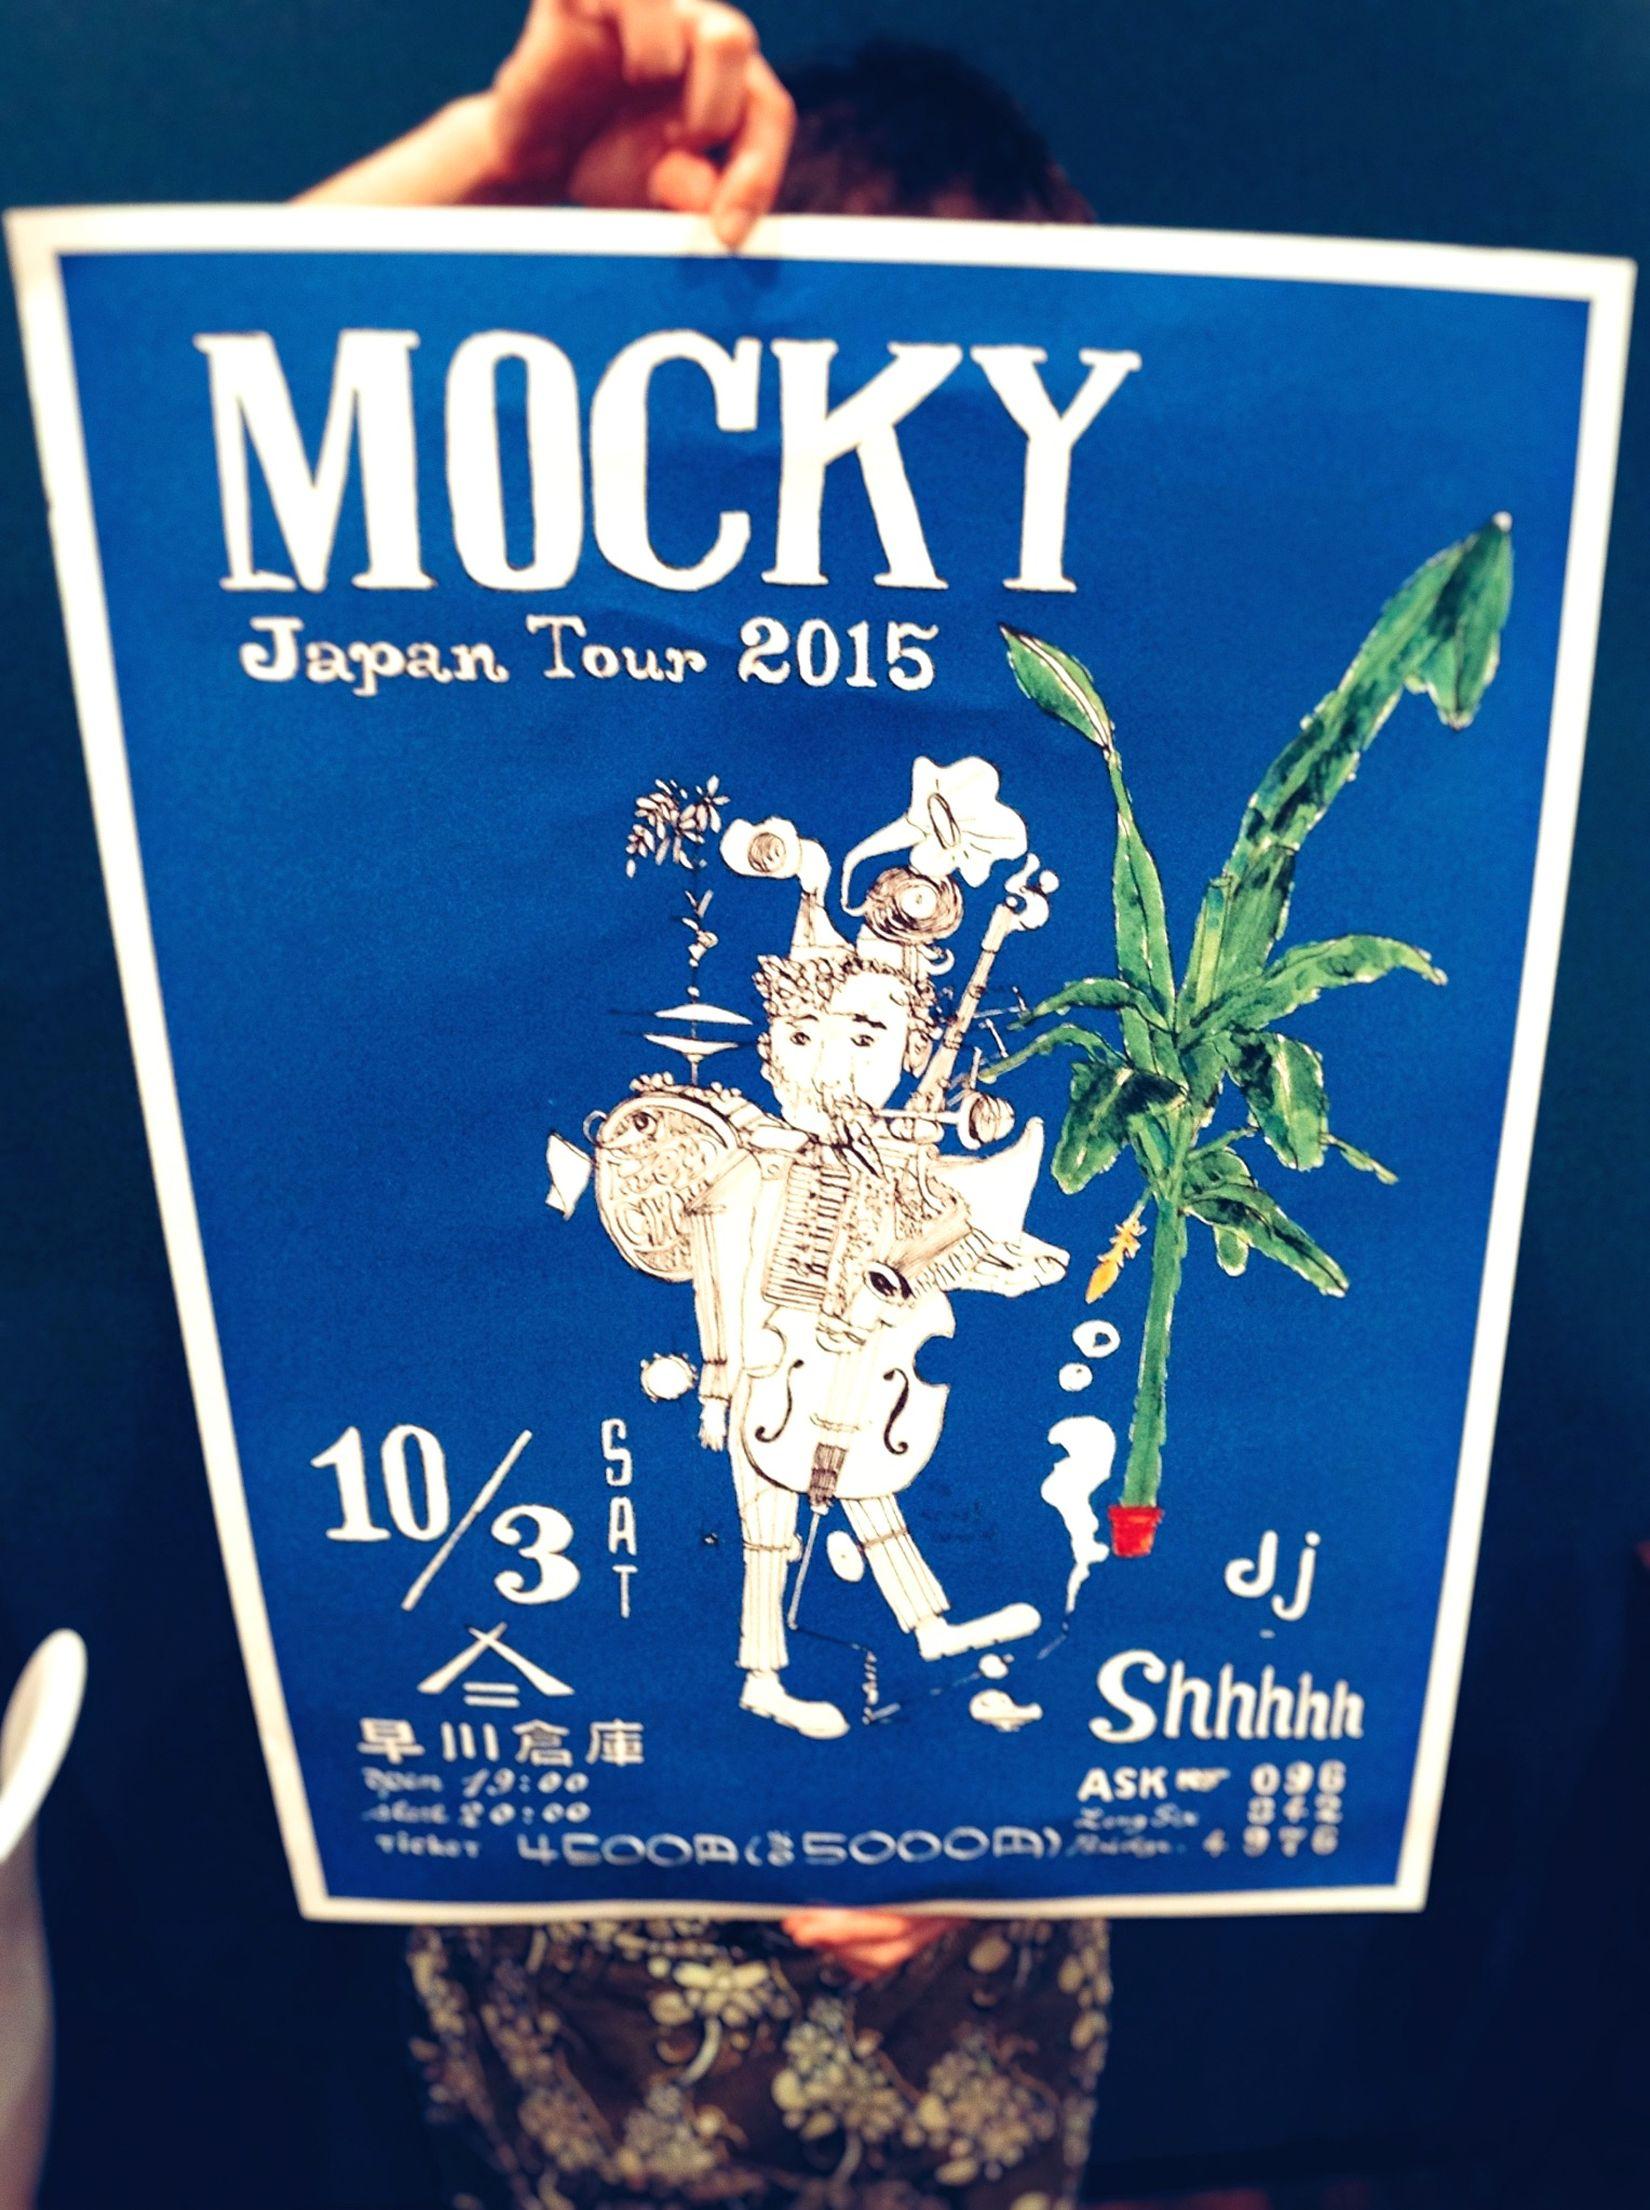 Poster Mocky Japan Enjoying Life Music IPhoneography Blue